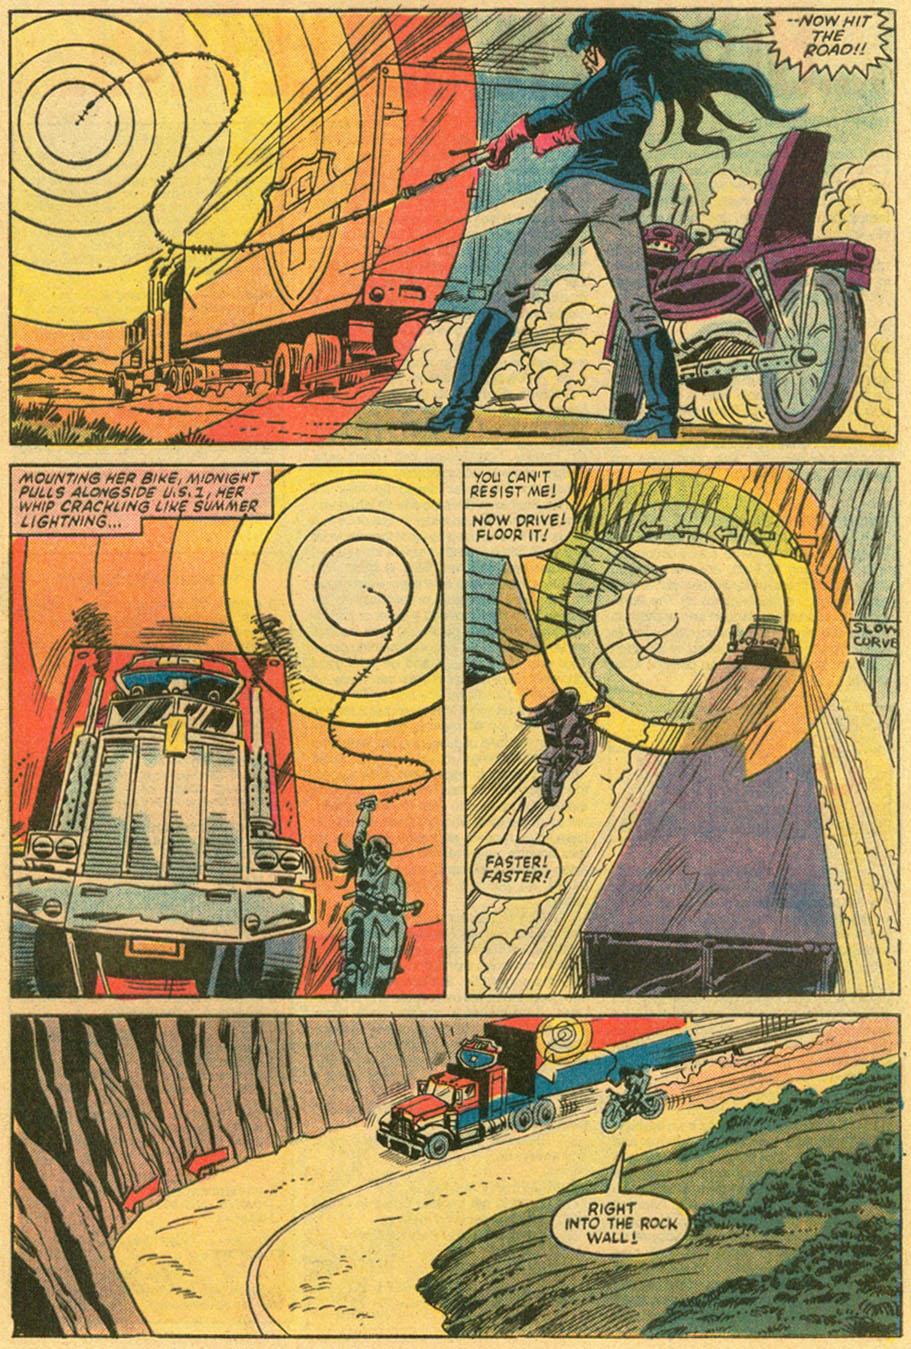 Read online U.S. 1 comic -  Issue #2 - 21